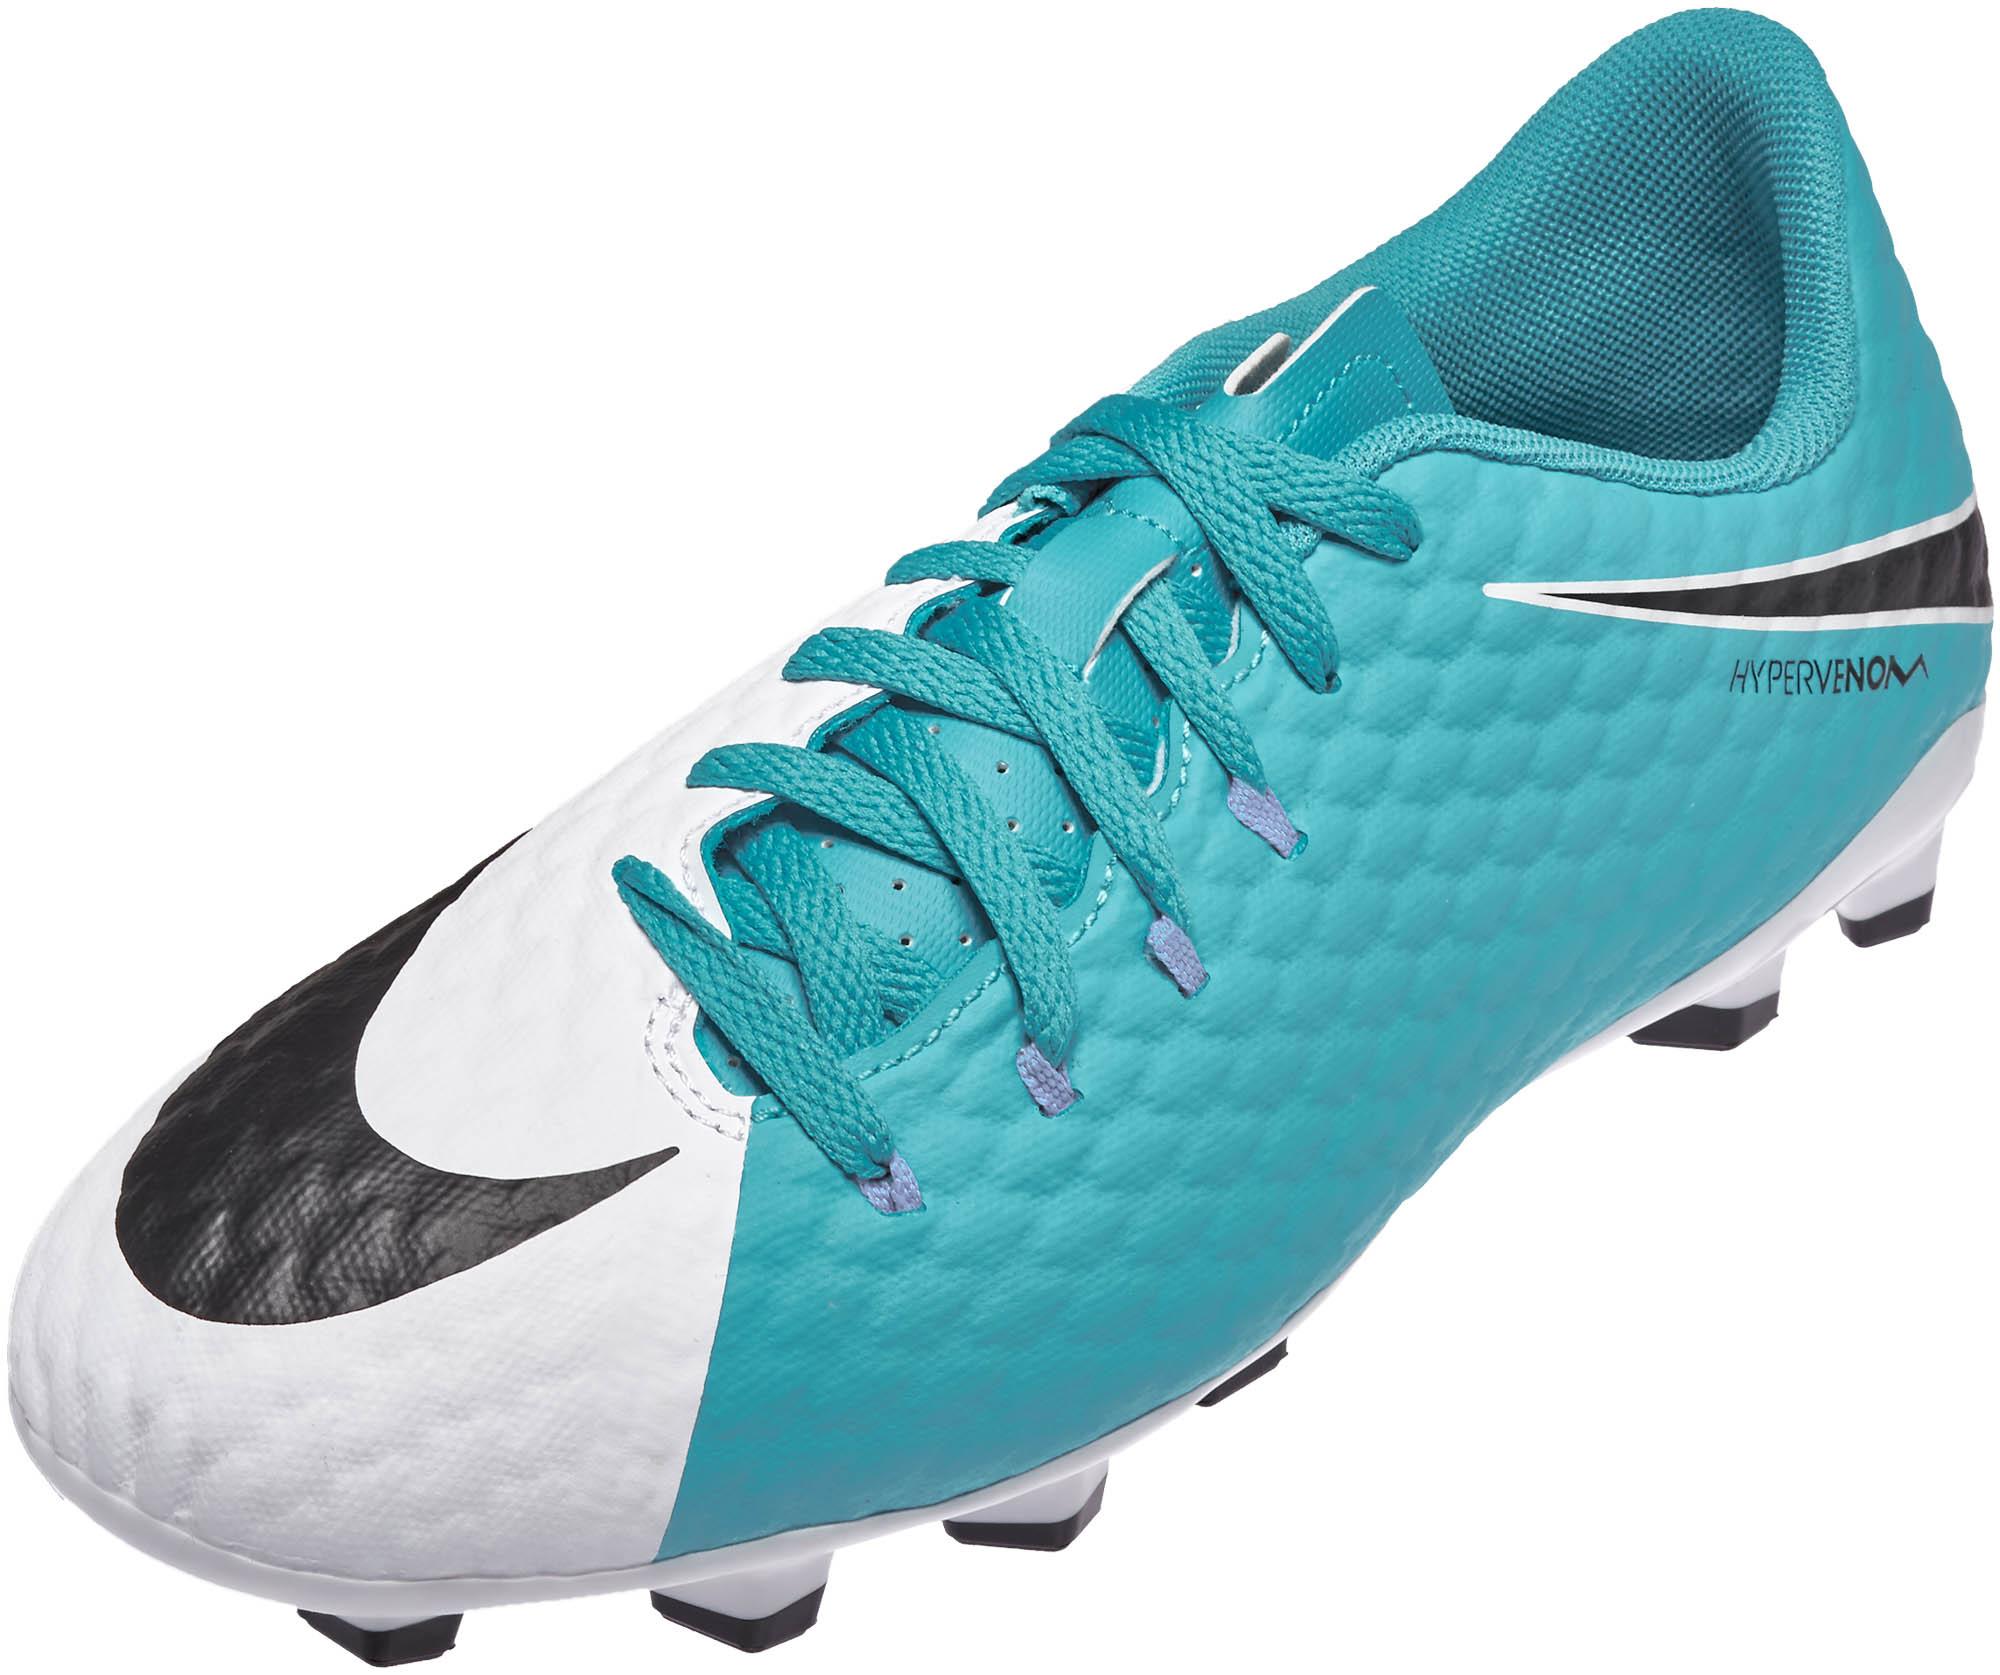 Nike Hypervenom Phelon III FG- Hypervenom Phelon Cleats